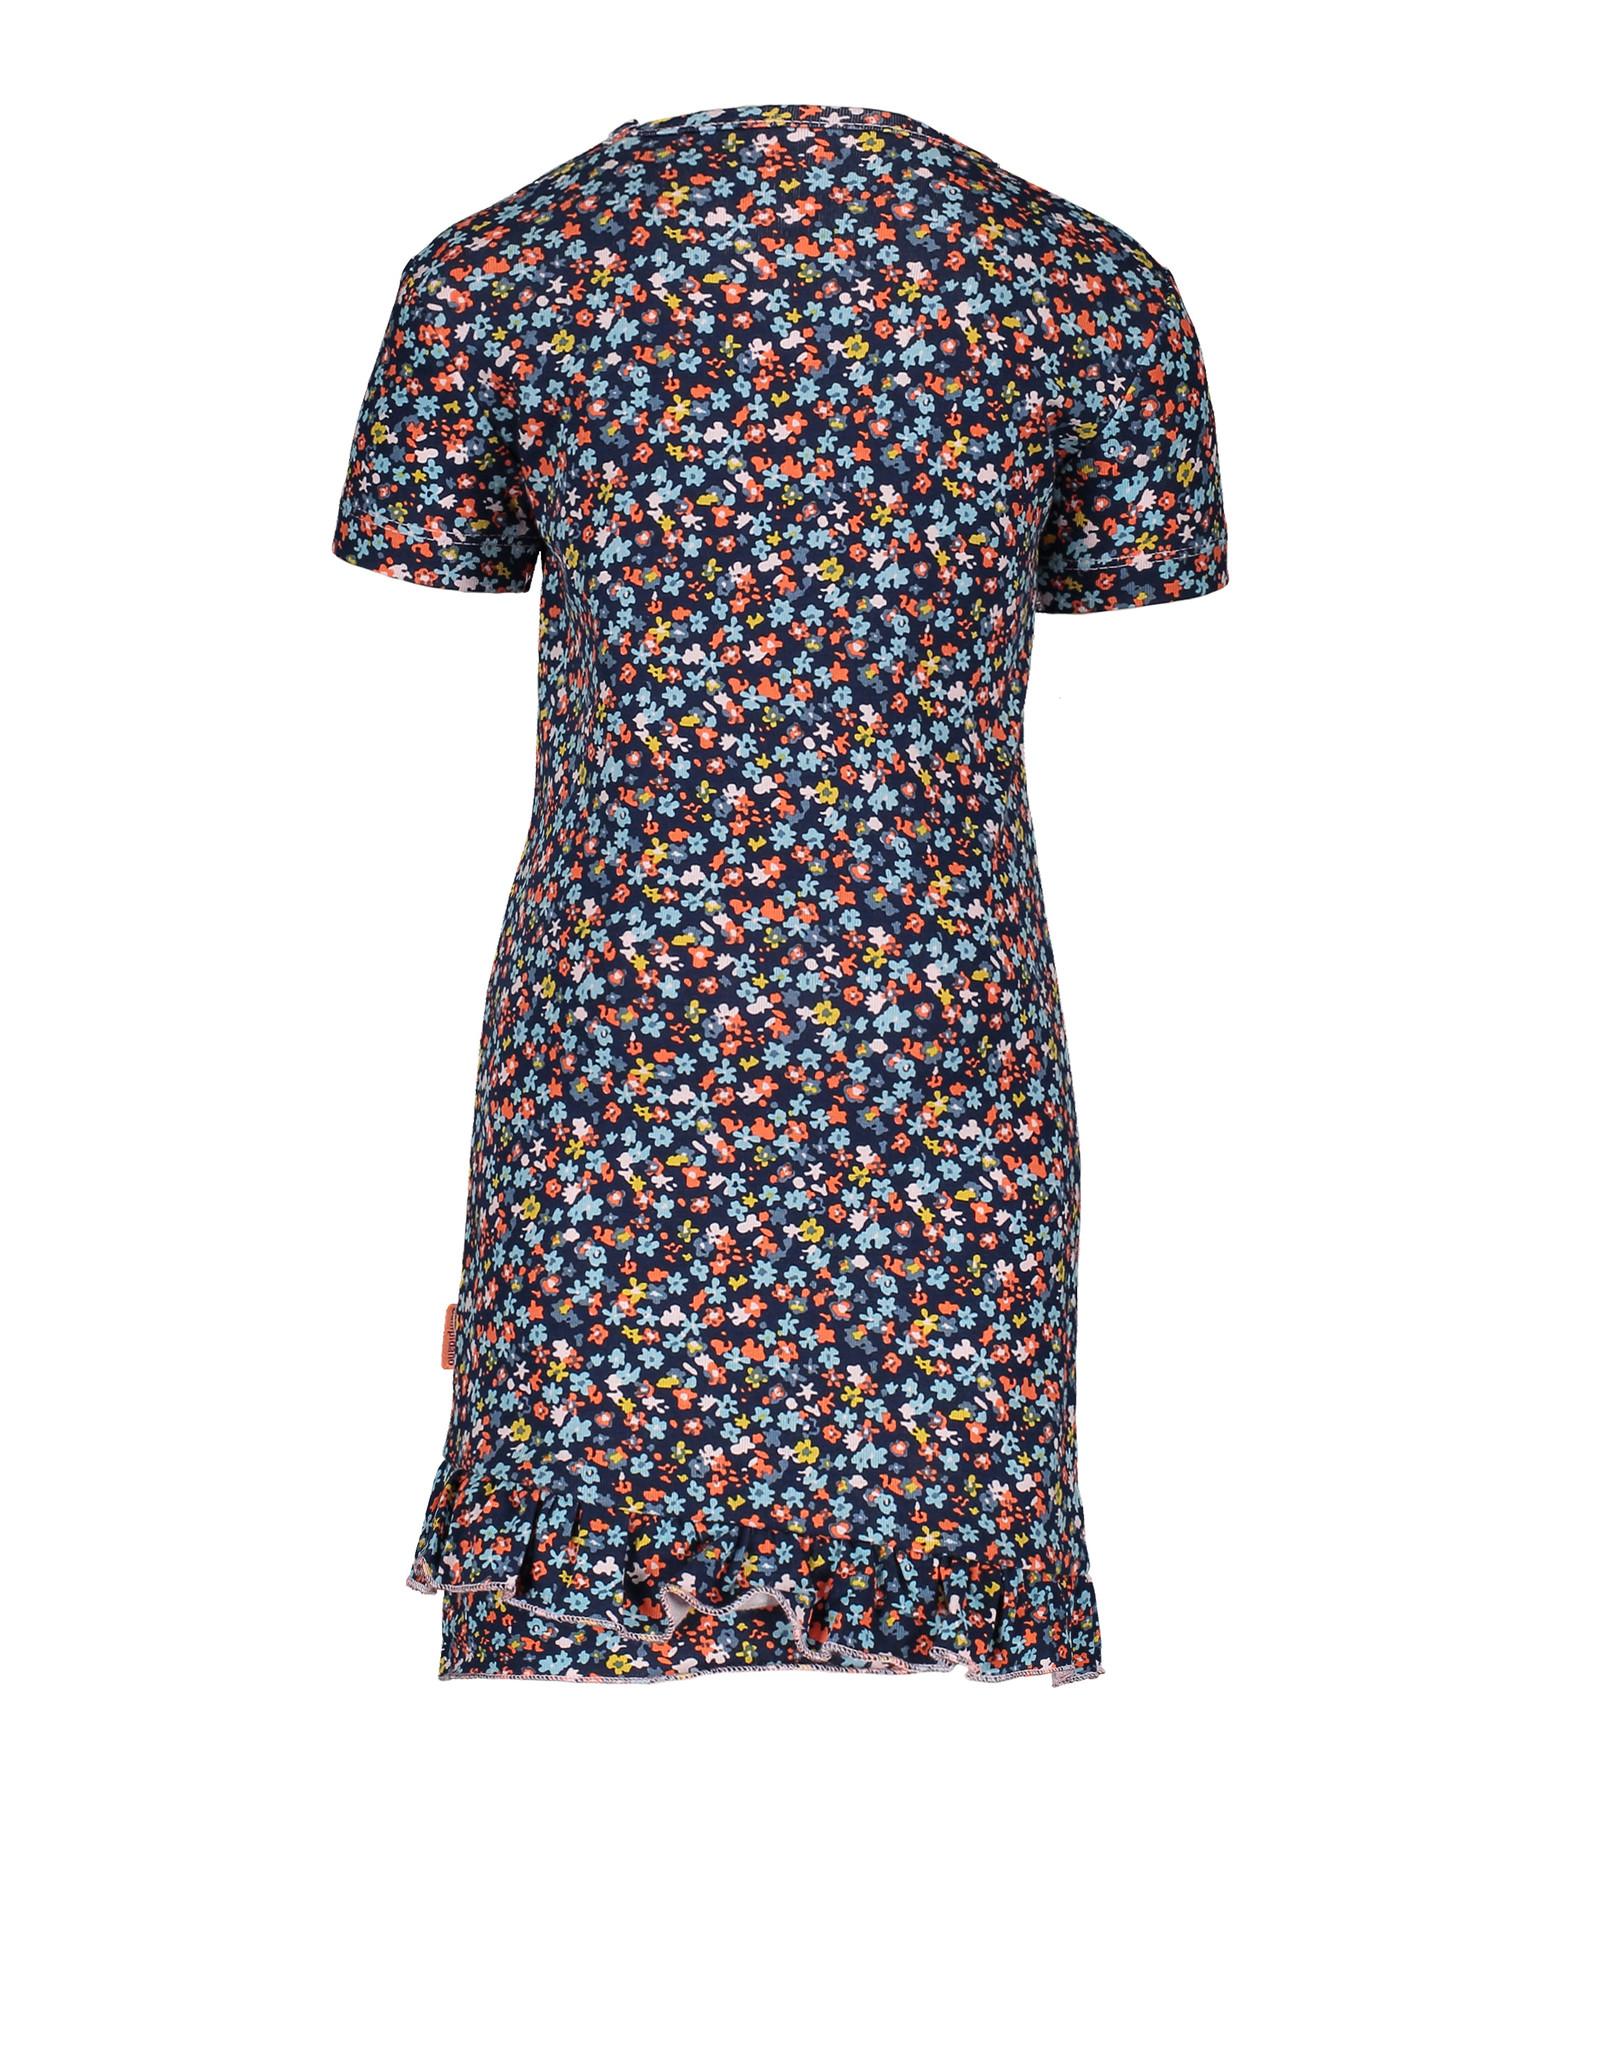 Bampidano Little Bampidano Girls short sleeve dress Dalia AO with hem ruffles FLOWER